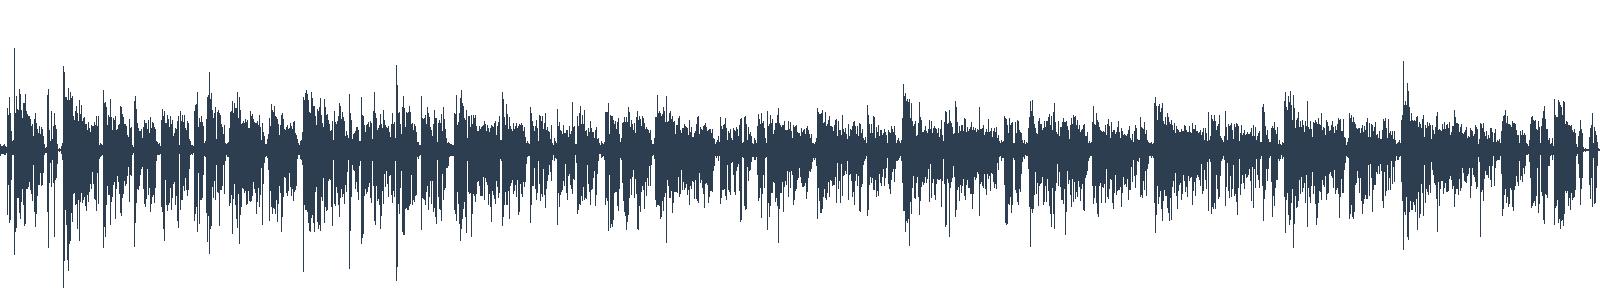 Nové audioknihy 23/2019 waveform